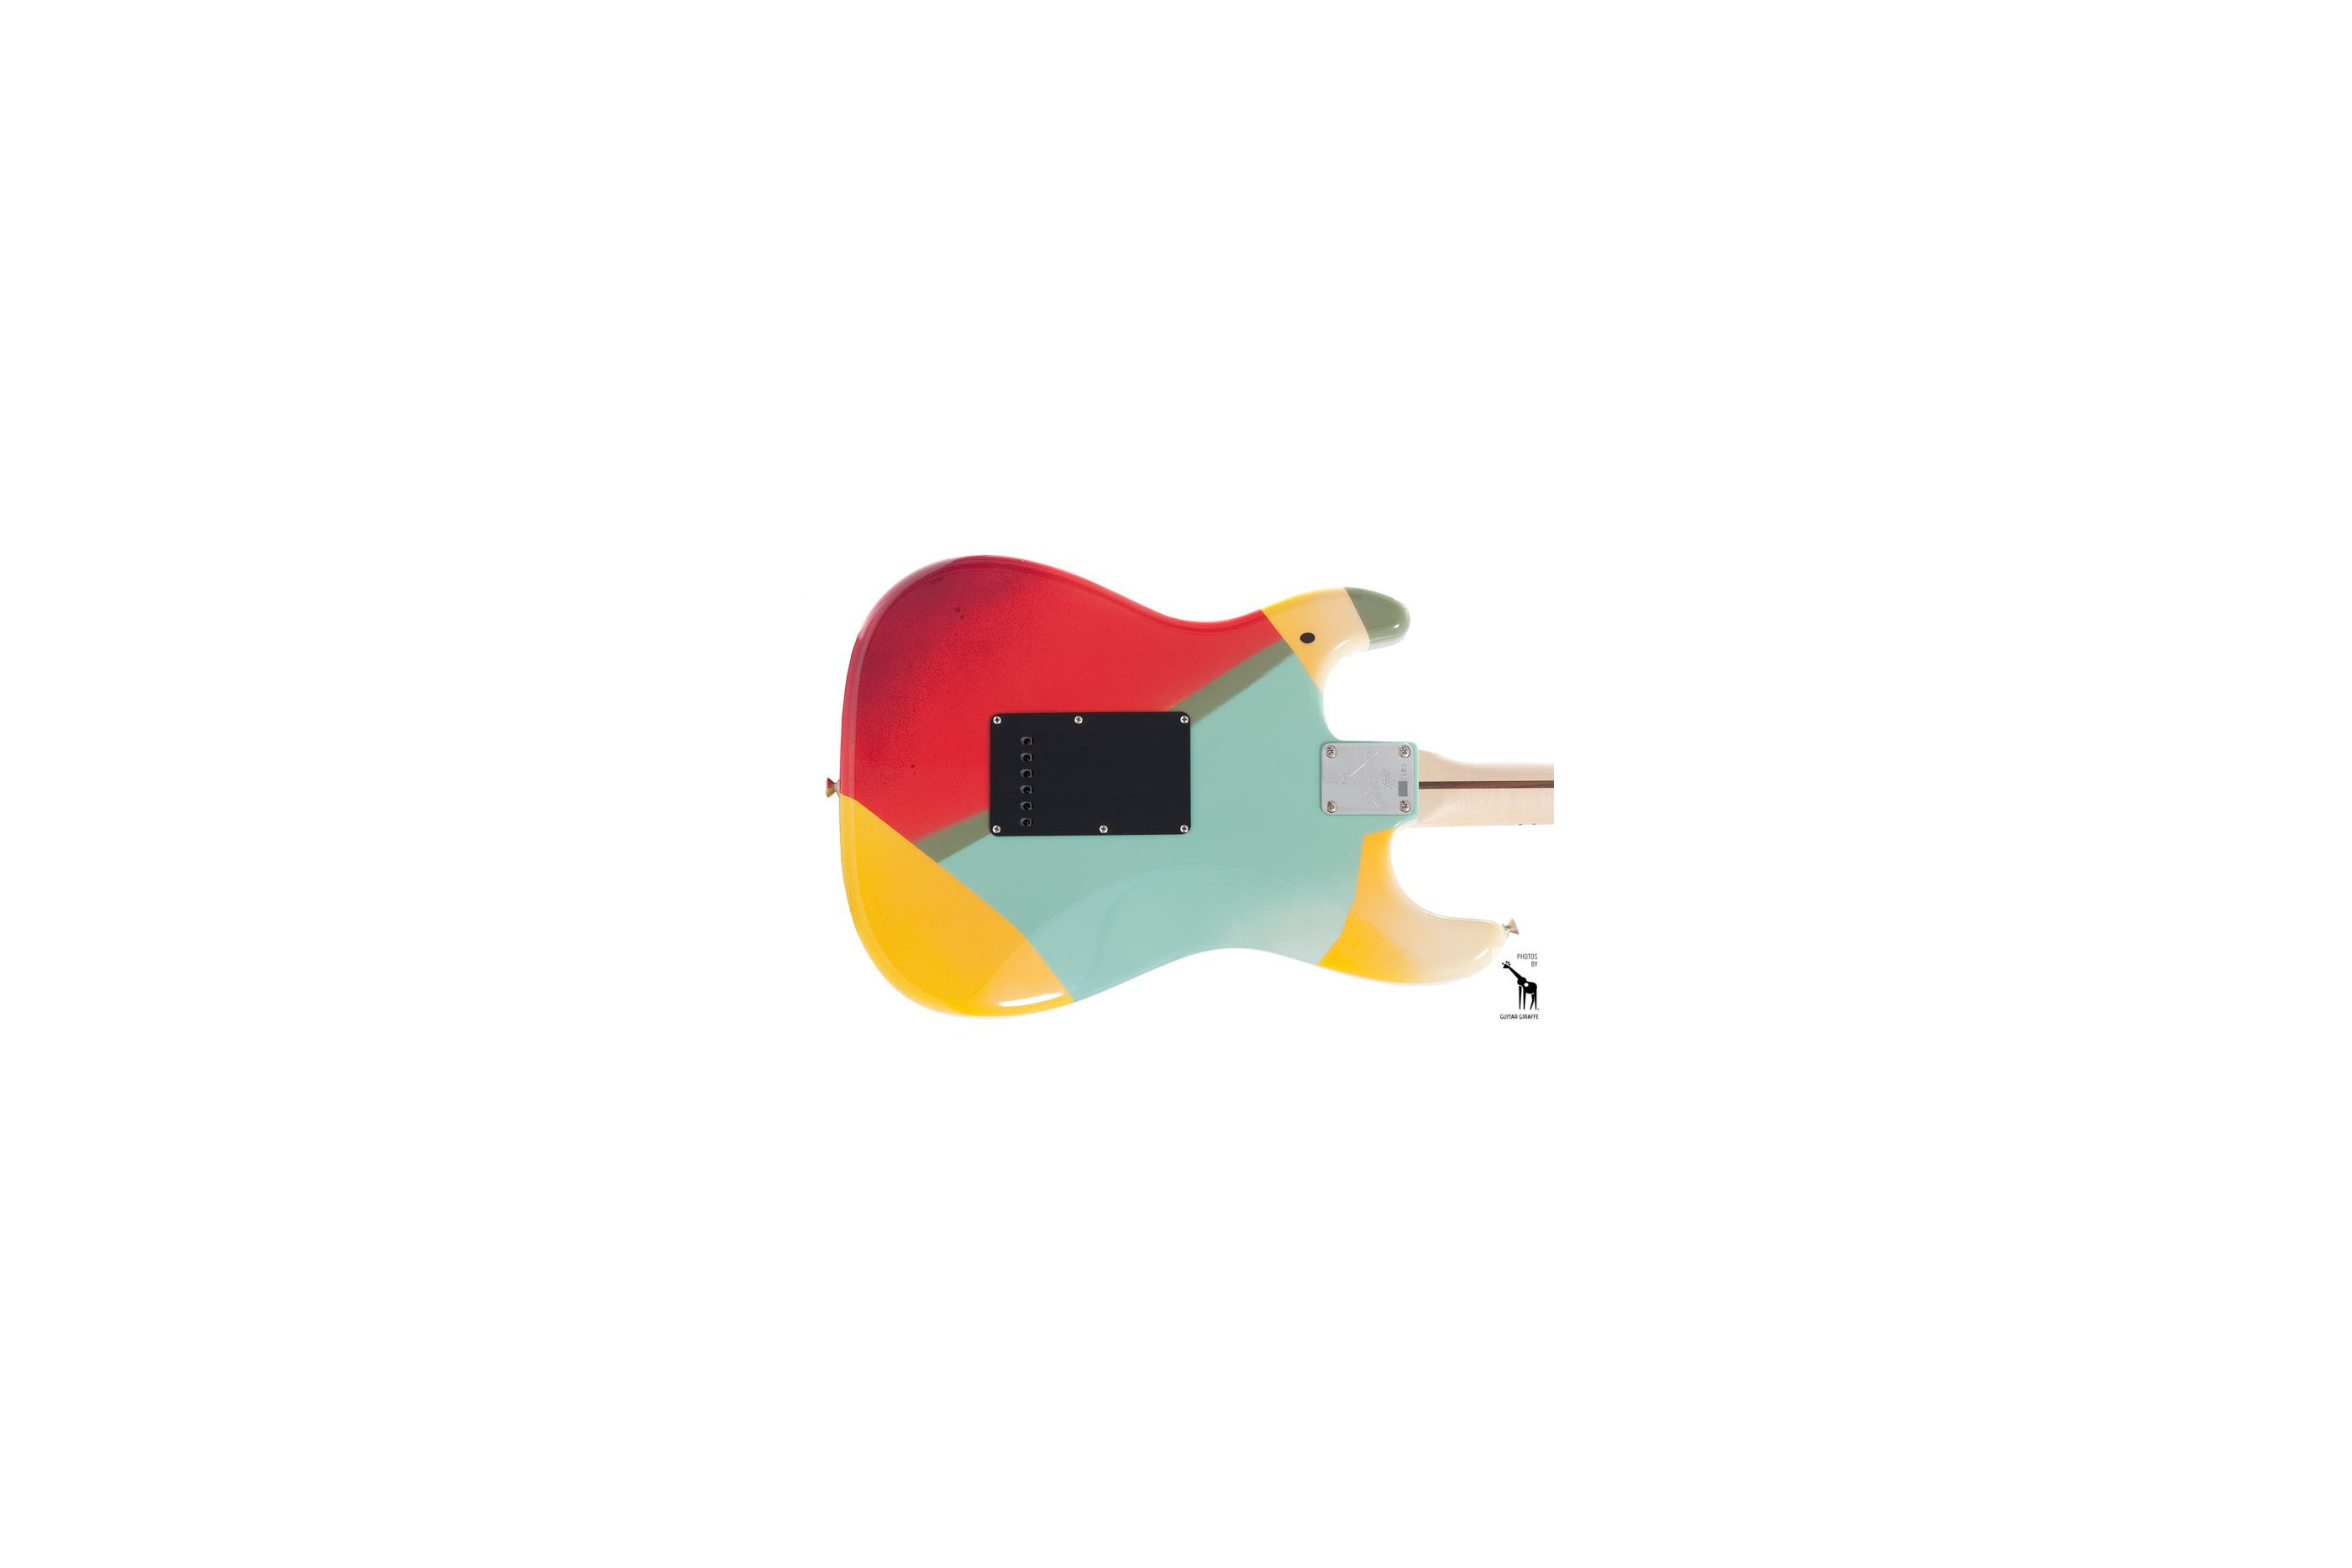 fender-custom-crash-stratocaster-49-of-50-clapton-limited